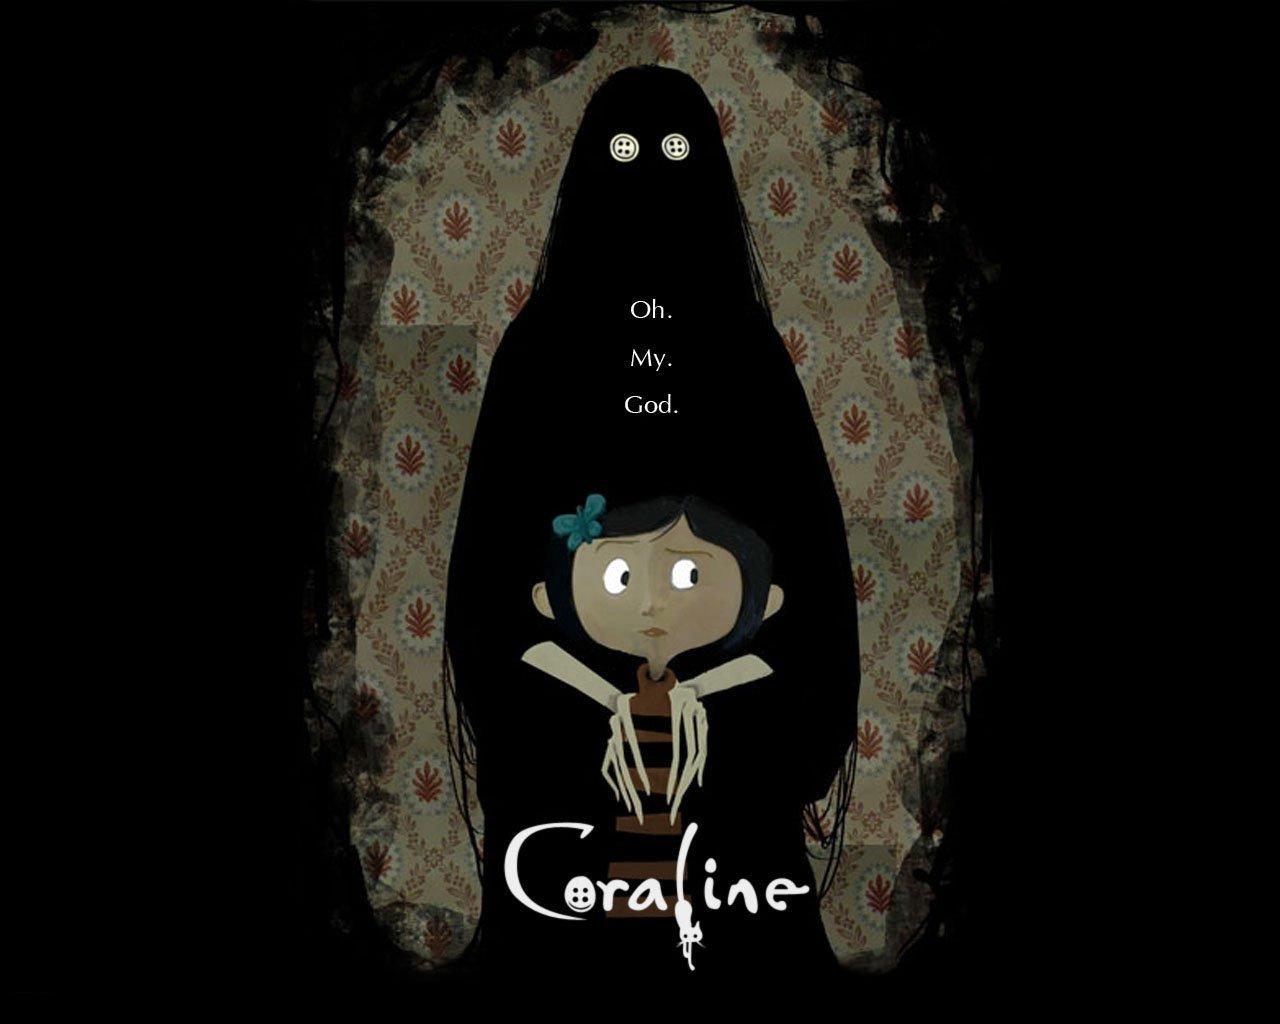 Jon Klassen Coraline